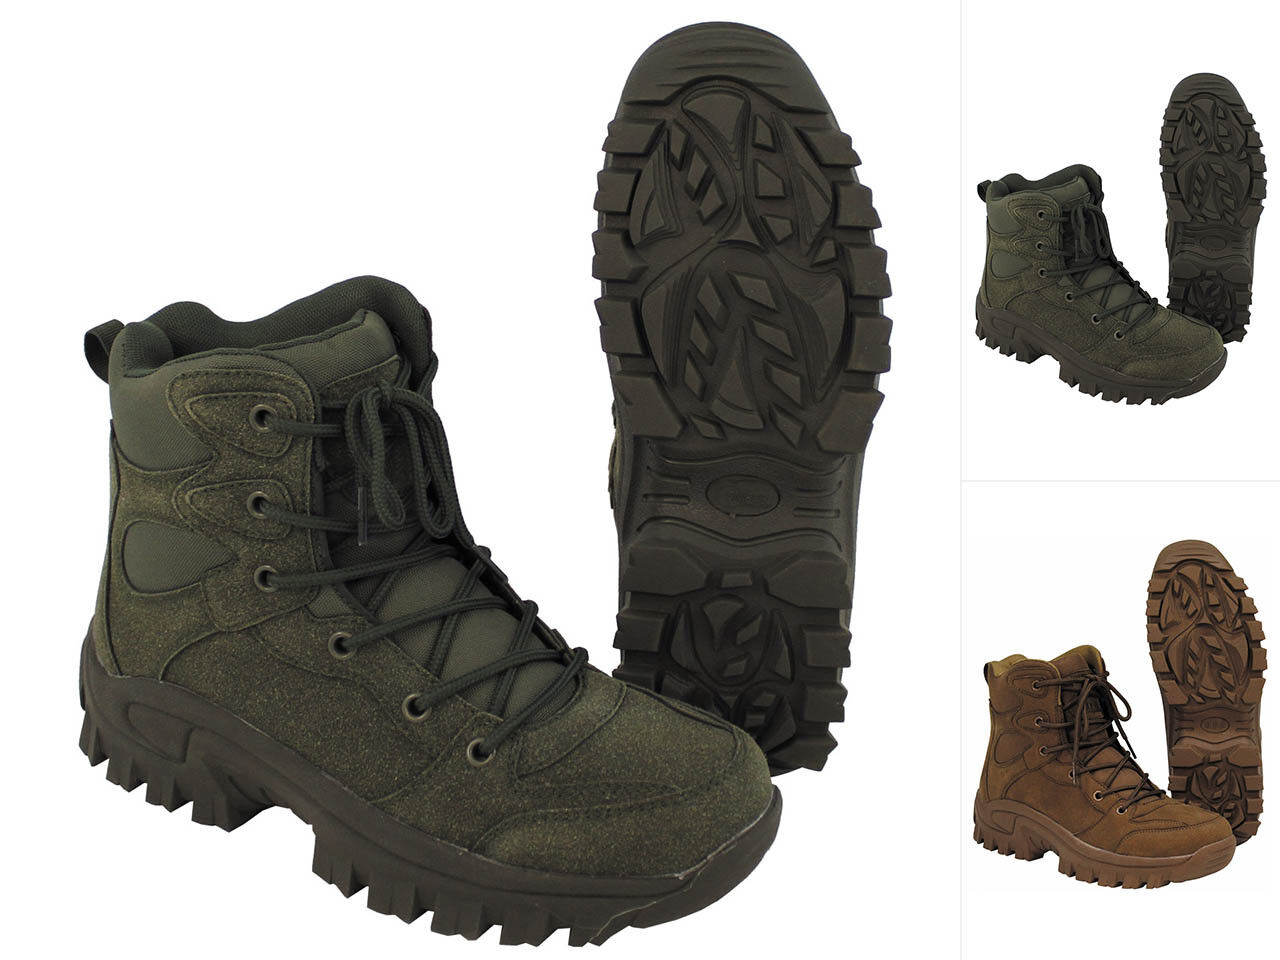 MFH 40-46 Stiefel Commando 40-46 MFH Wanderschuhe Trekkingschuhe Schuhe Bergschuhe eb20a4